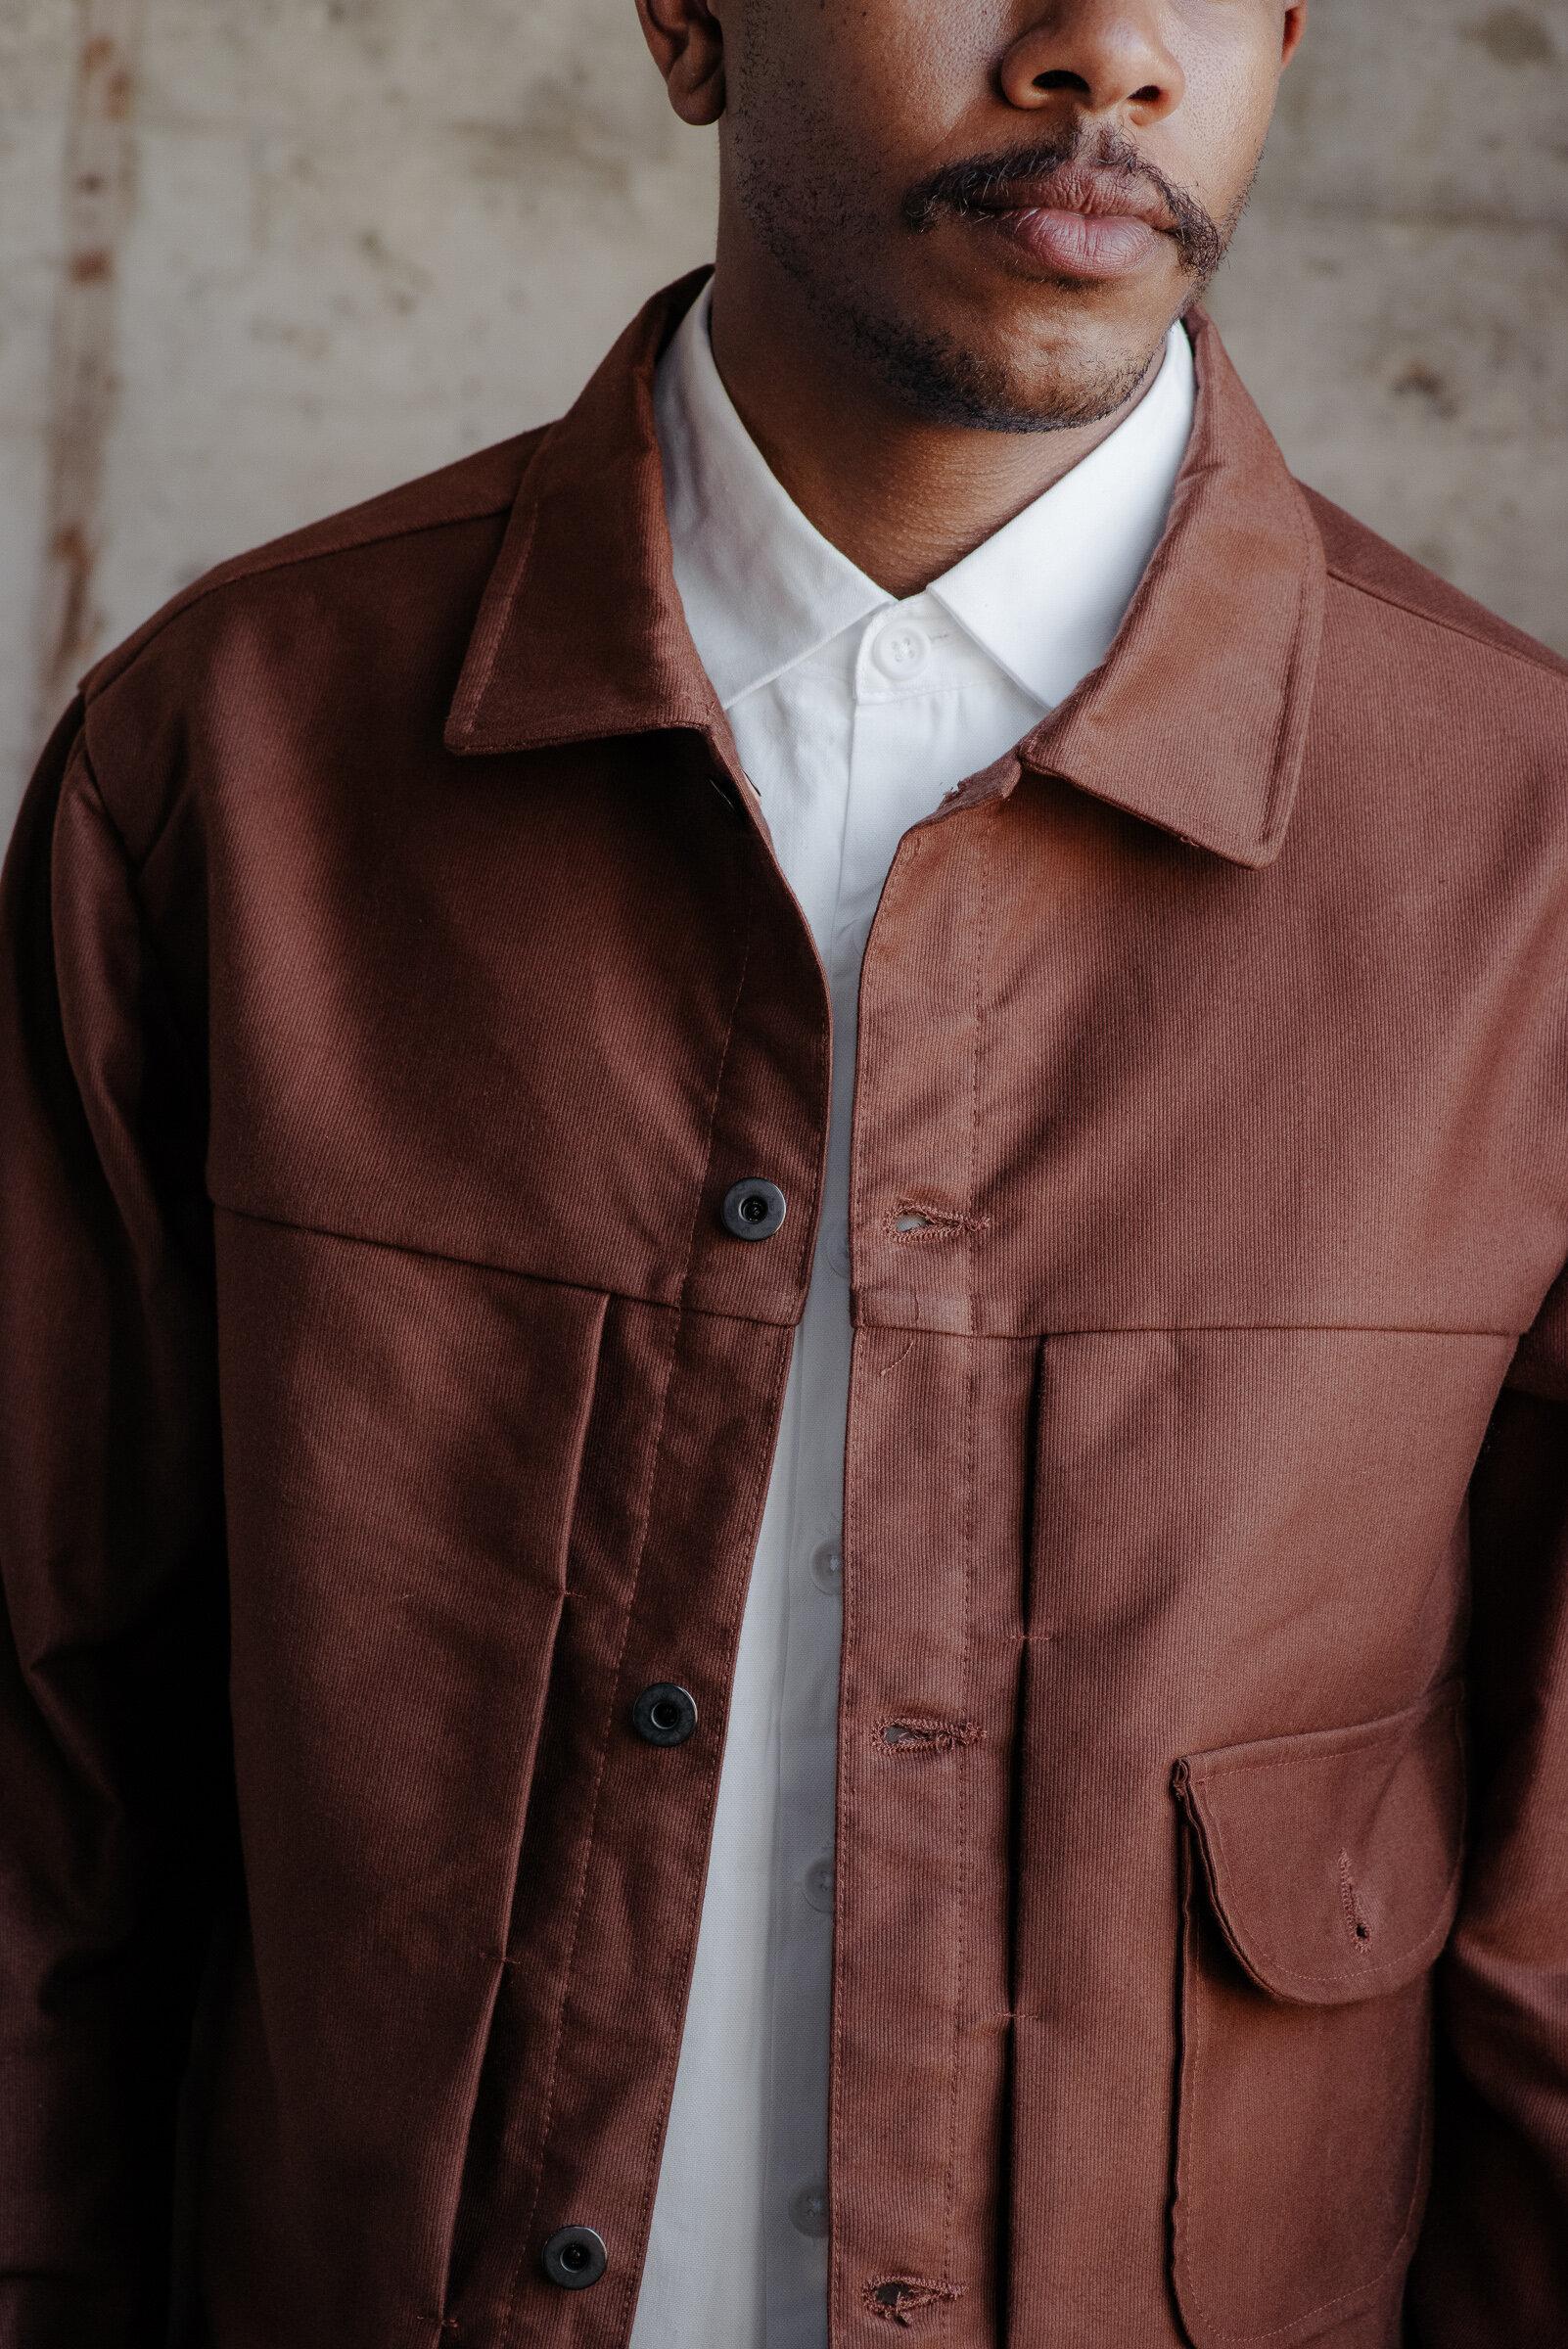 evan-kinori-pleated-jacket-bedford-cord-cotton-woven-in-japan-5